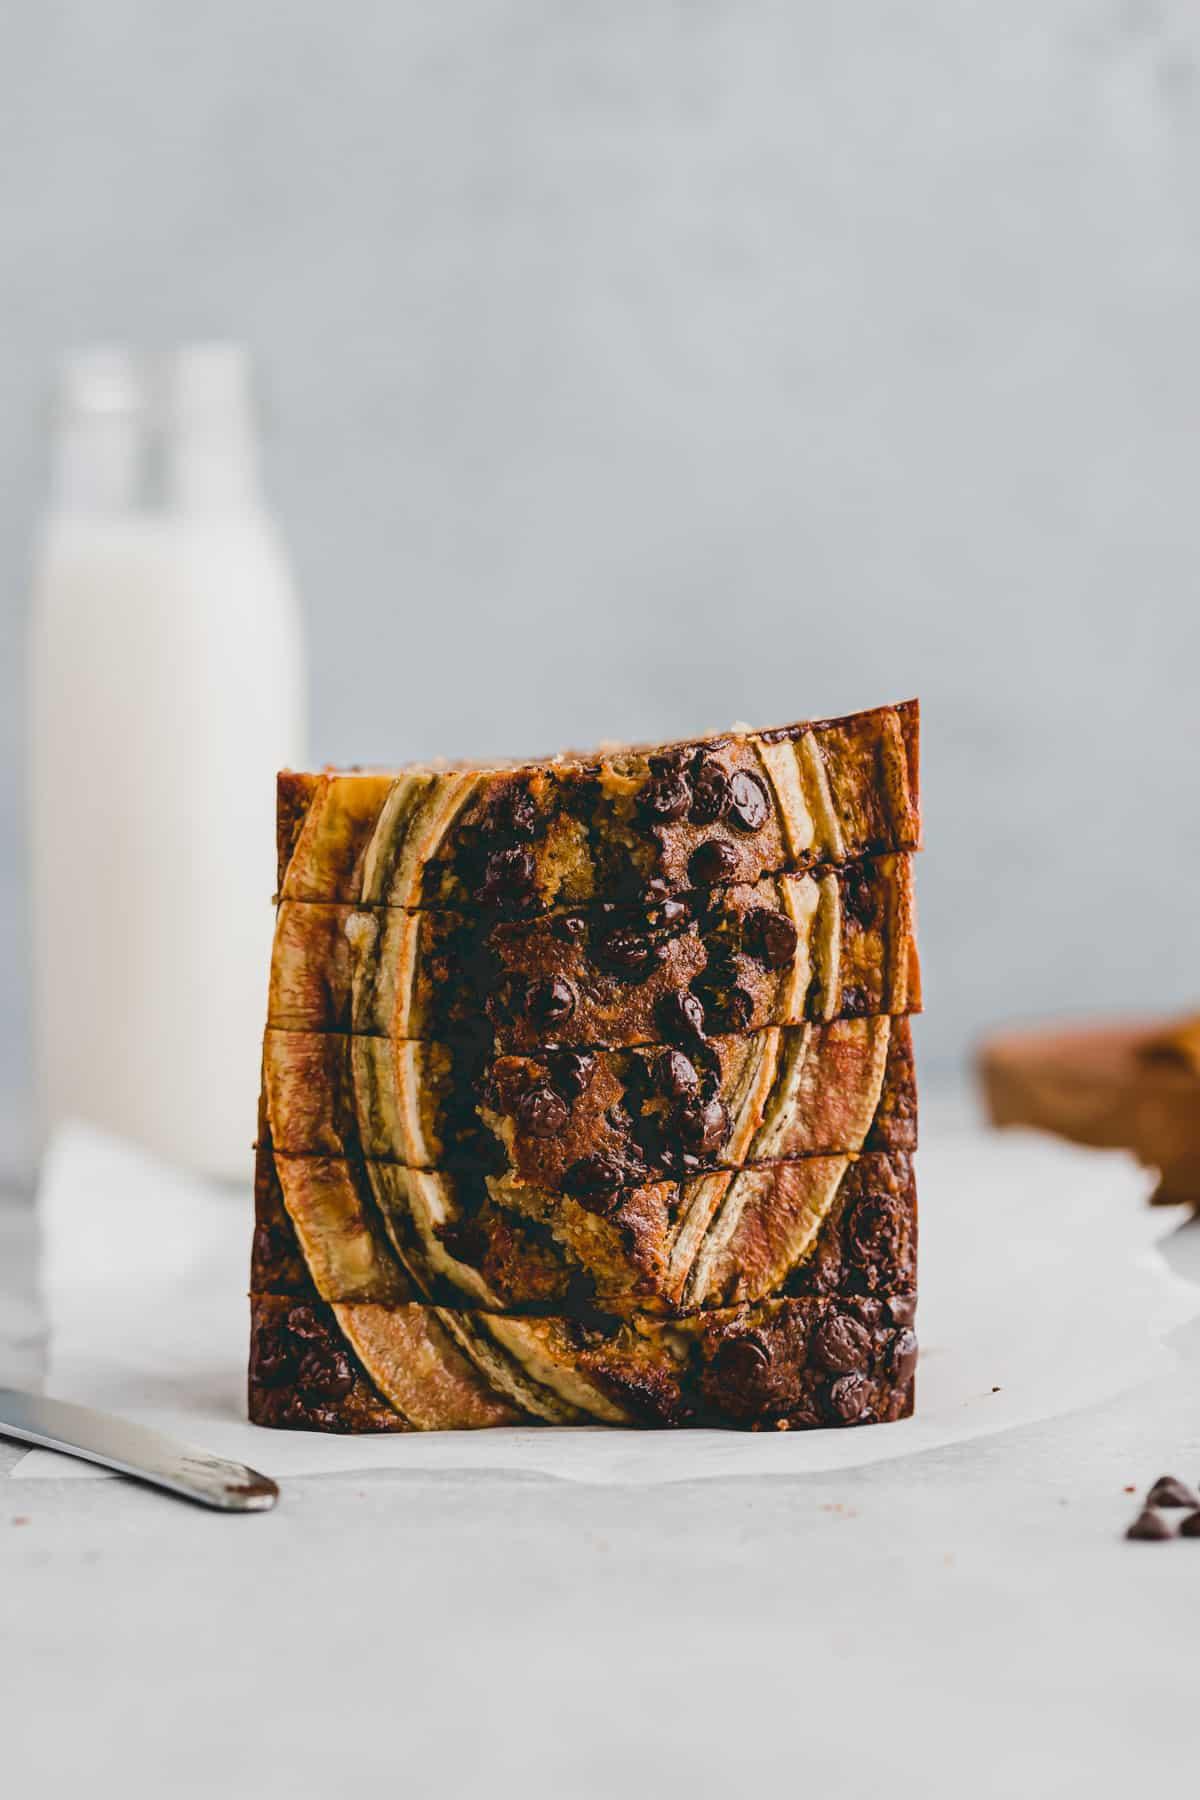 a stack of sliced gluten-free banana bread